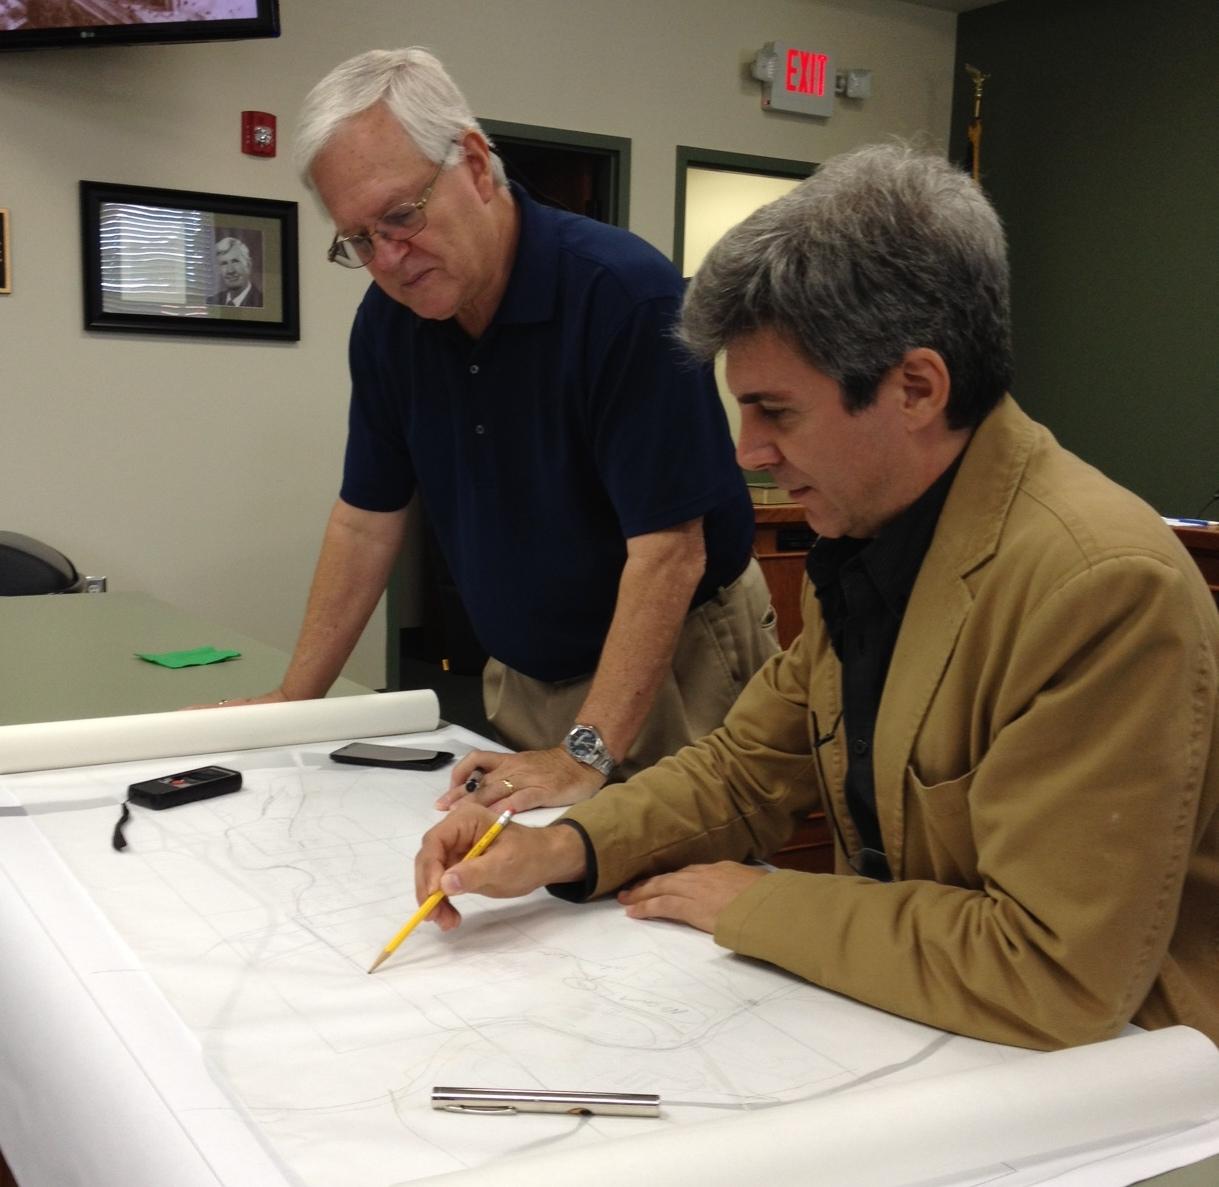 Demetri Baches and Rick Hall at workshop